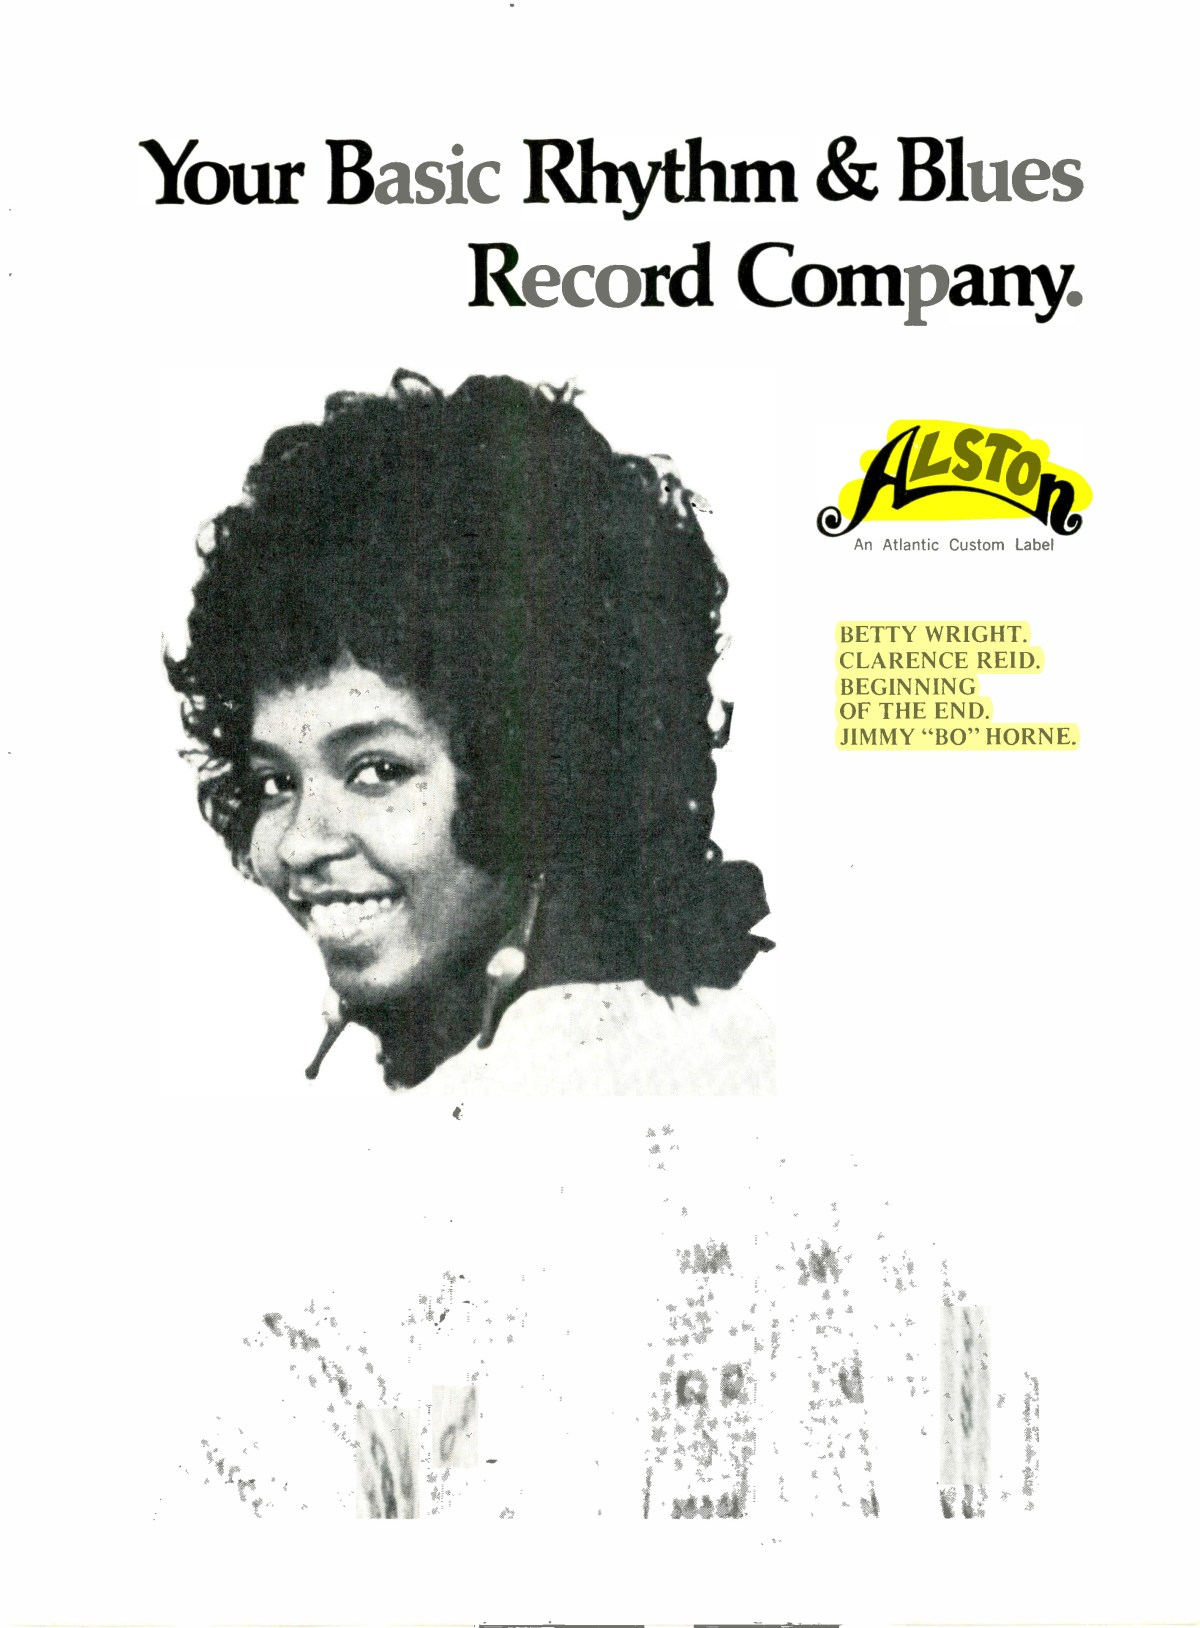 Alston Records Rhythm and Blues Company